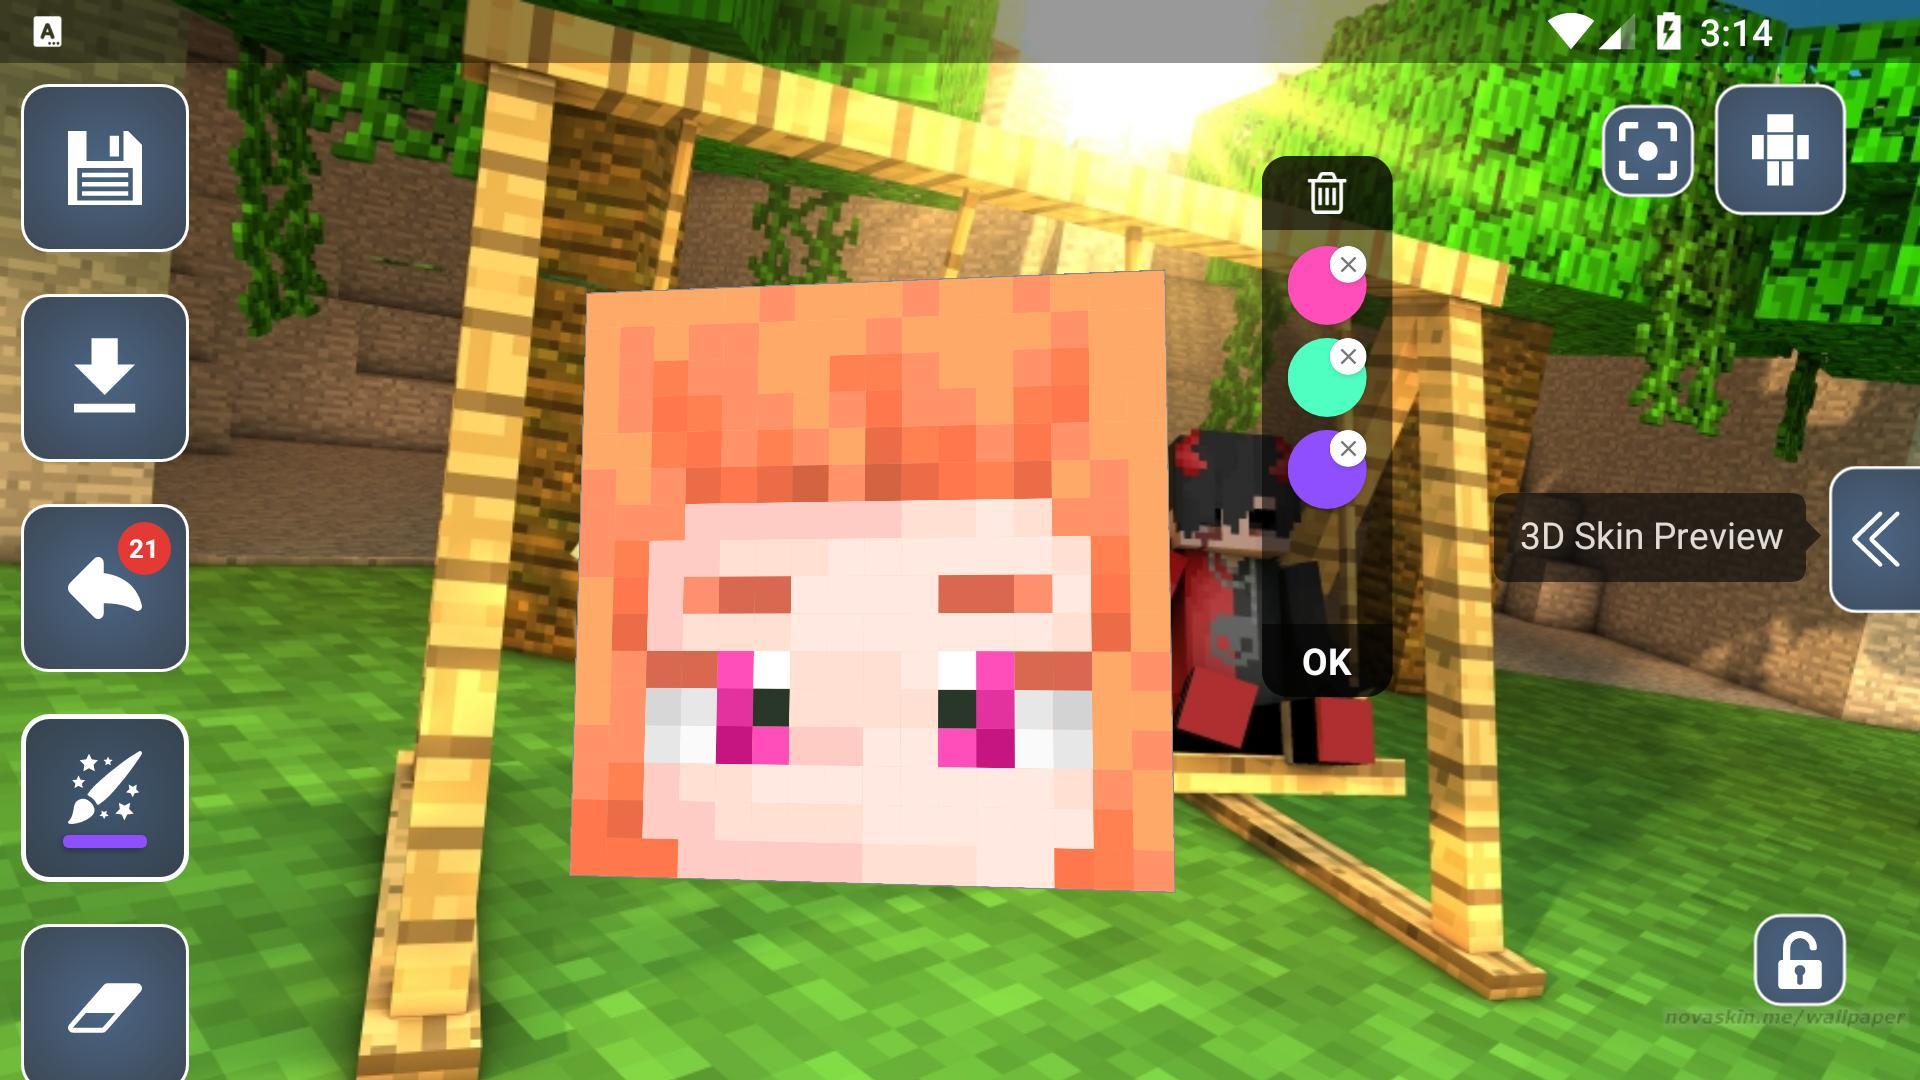 HD Skins Editor for Minecraft PE(11x11) para Android - APK Baixar